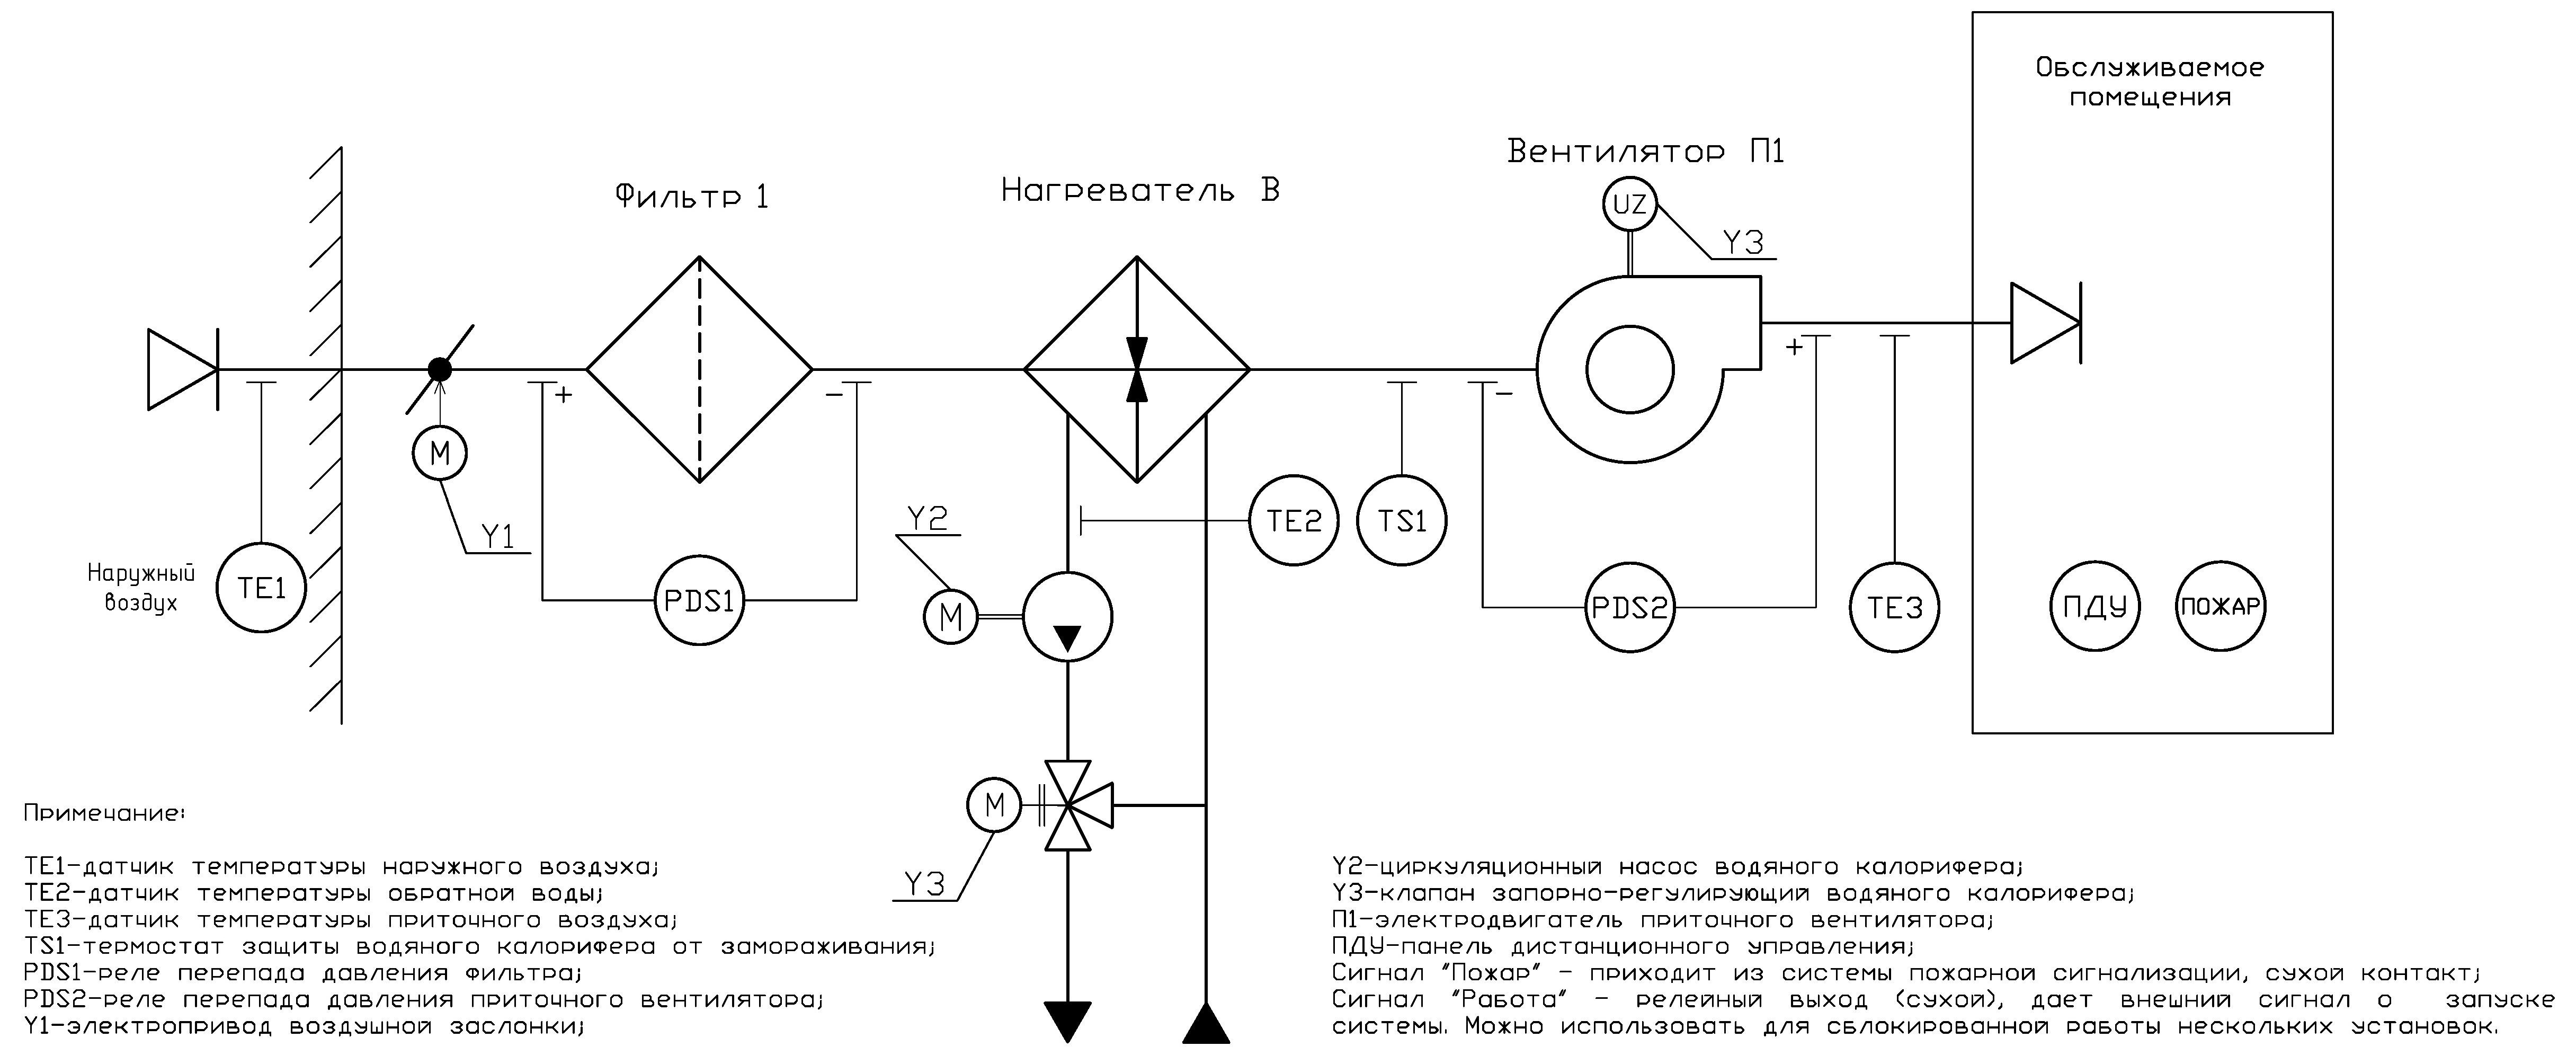 Вентиляция схема калорифер